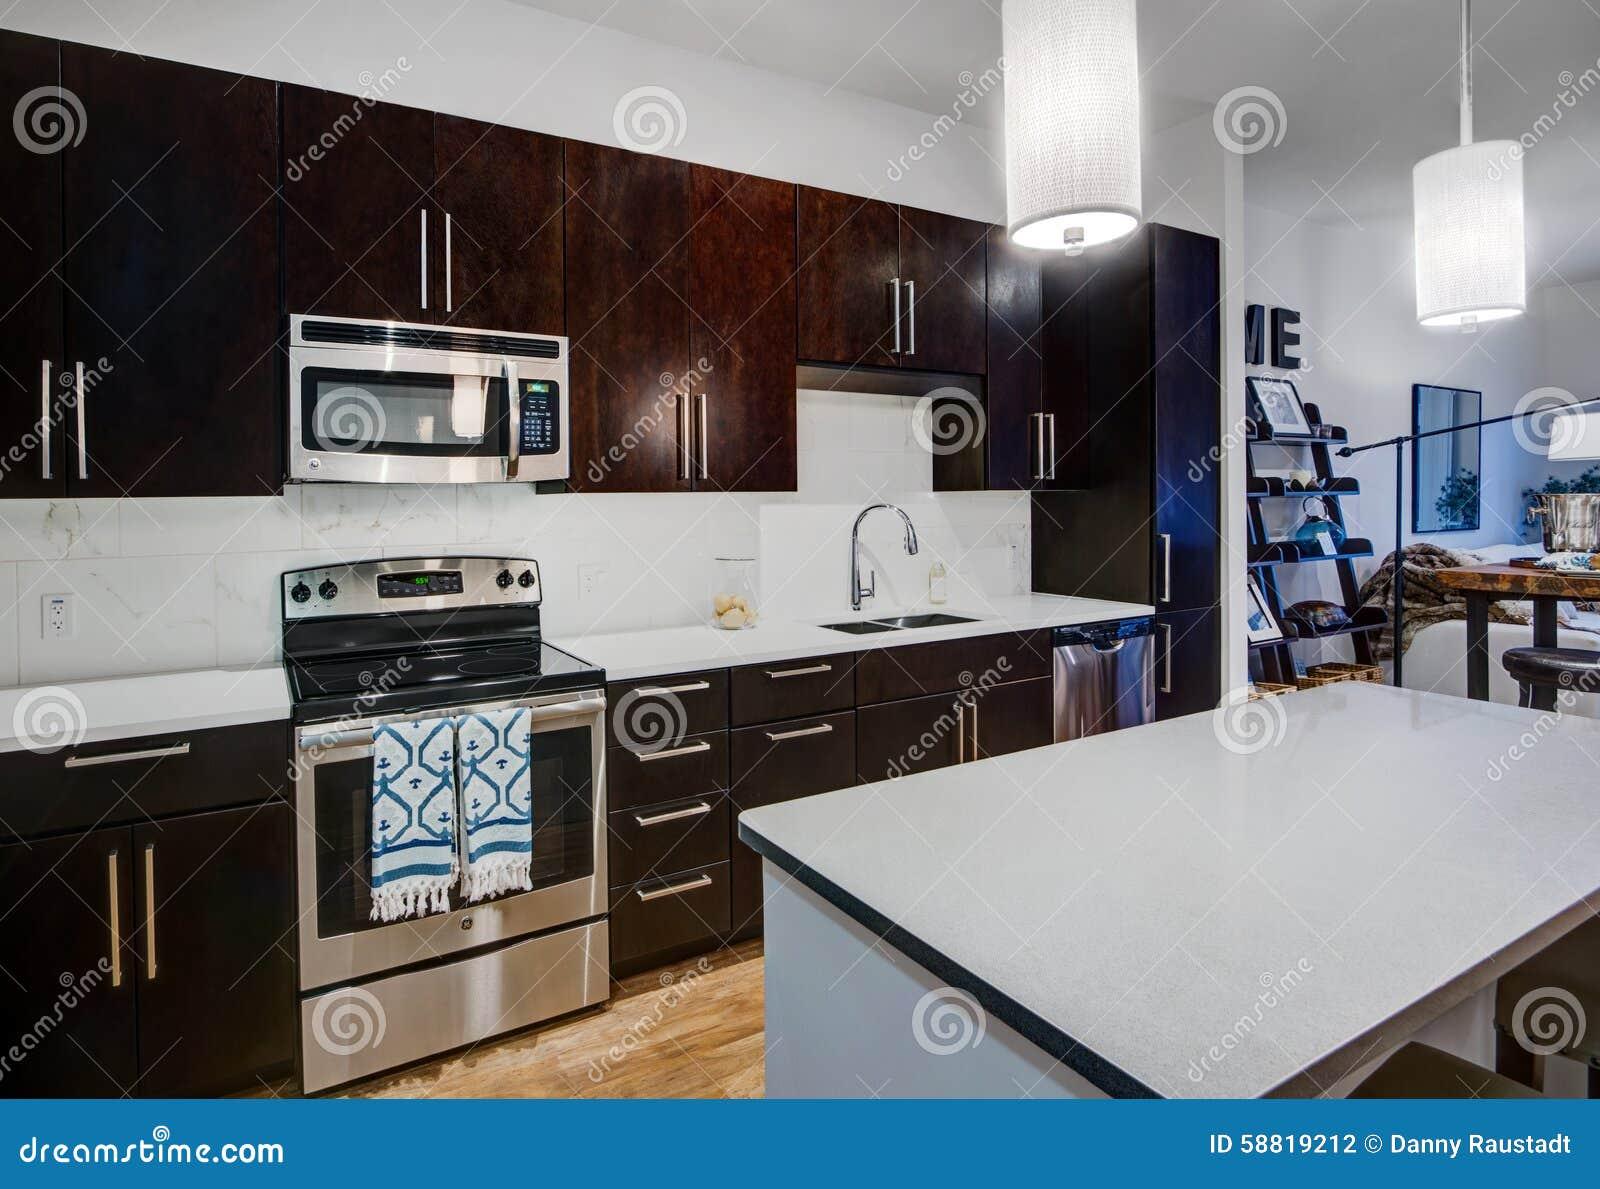 cuisine moderne d 39 appartement photo stock image du home coutume 58819212. Black Bedroom Furniture Sets. Home Design Ideas